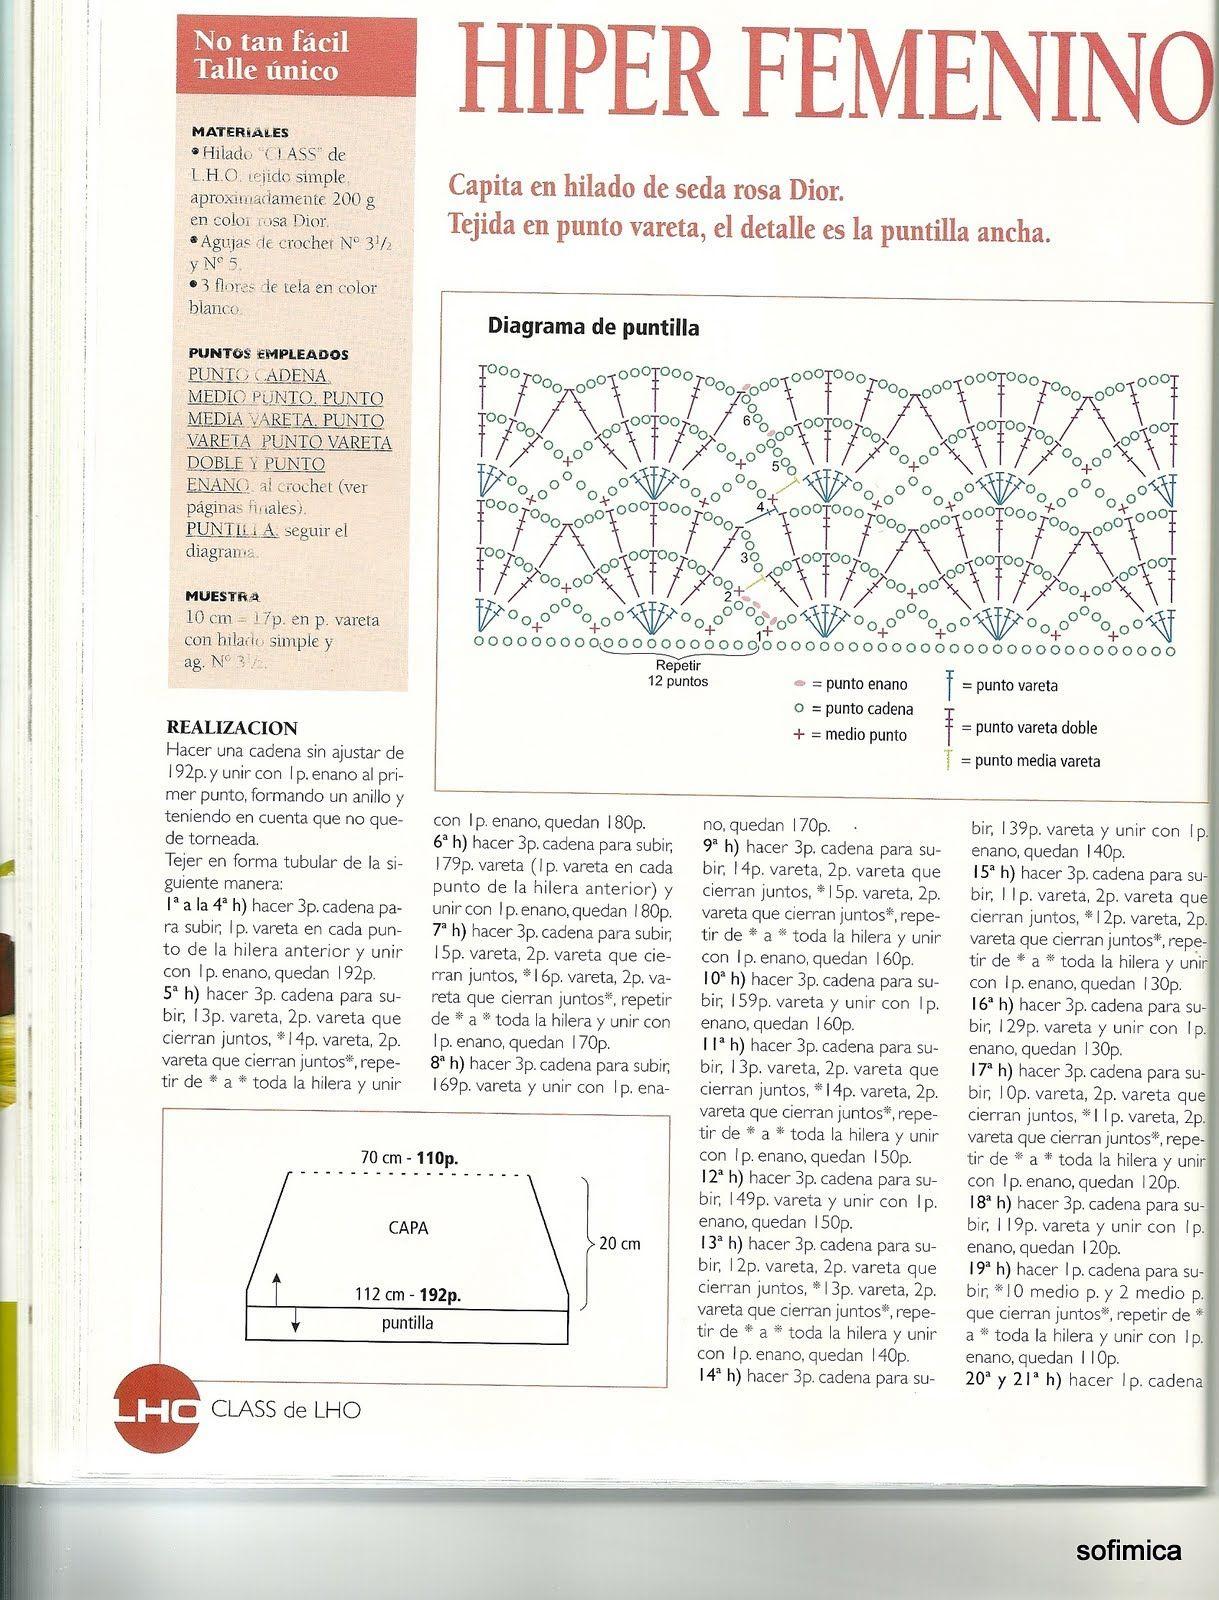 Patrones Crochet: Chal Hiperfemenino Patron | Crochet hermoso ...